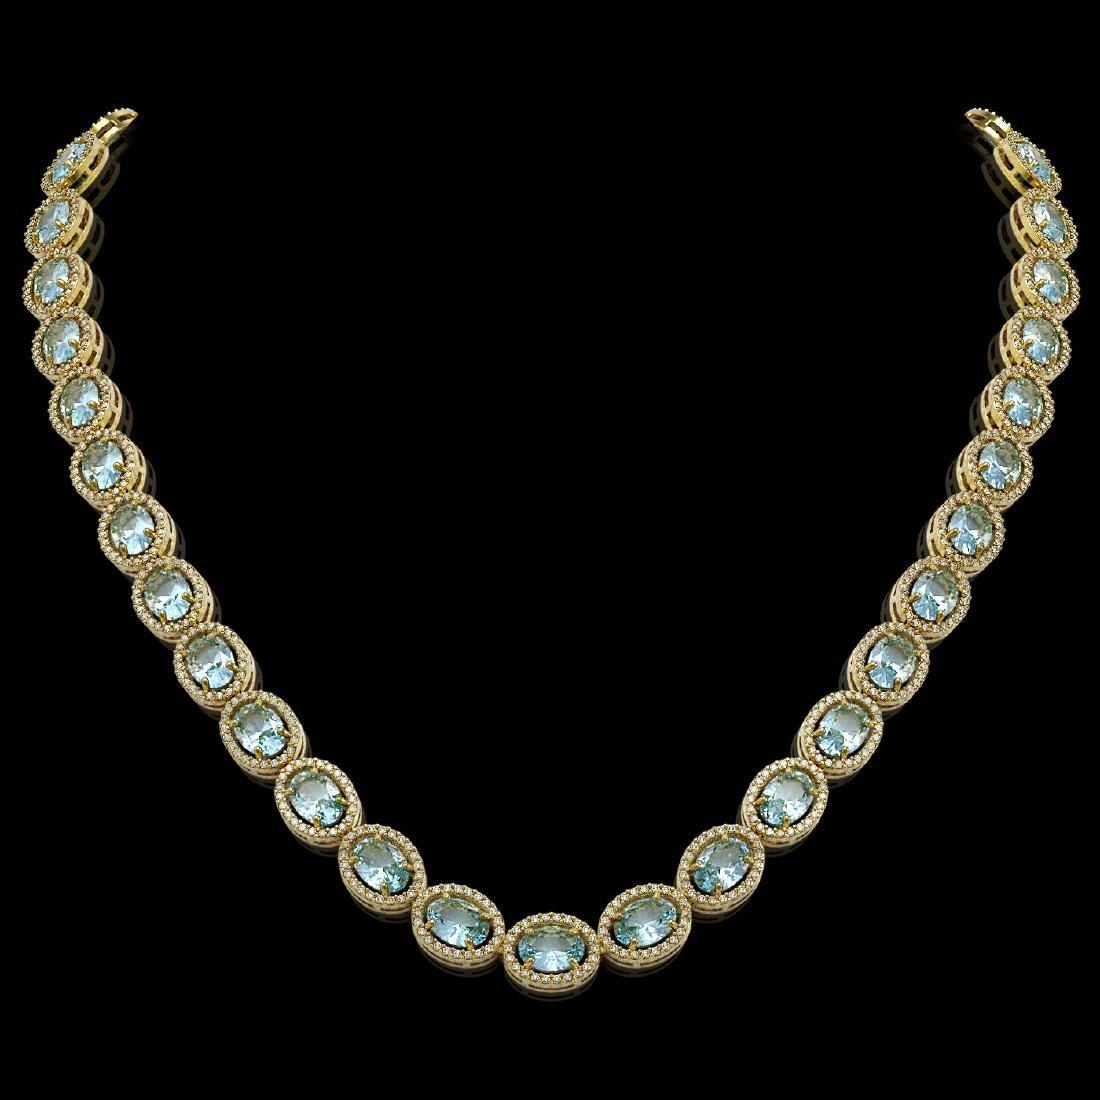 41.88 CTW Aquamarine & Diamond Halo Necklace 10K Yellow